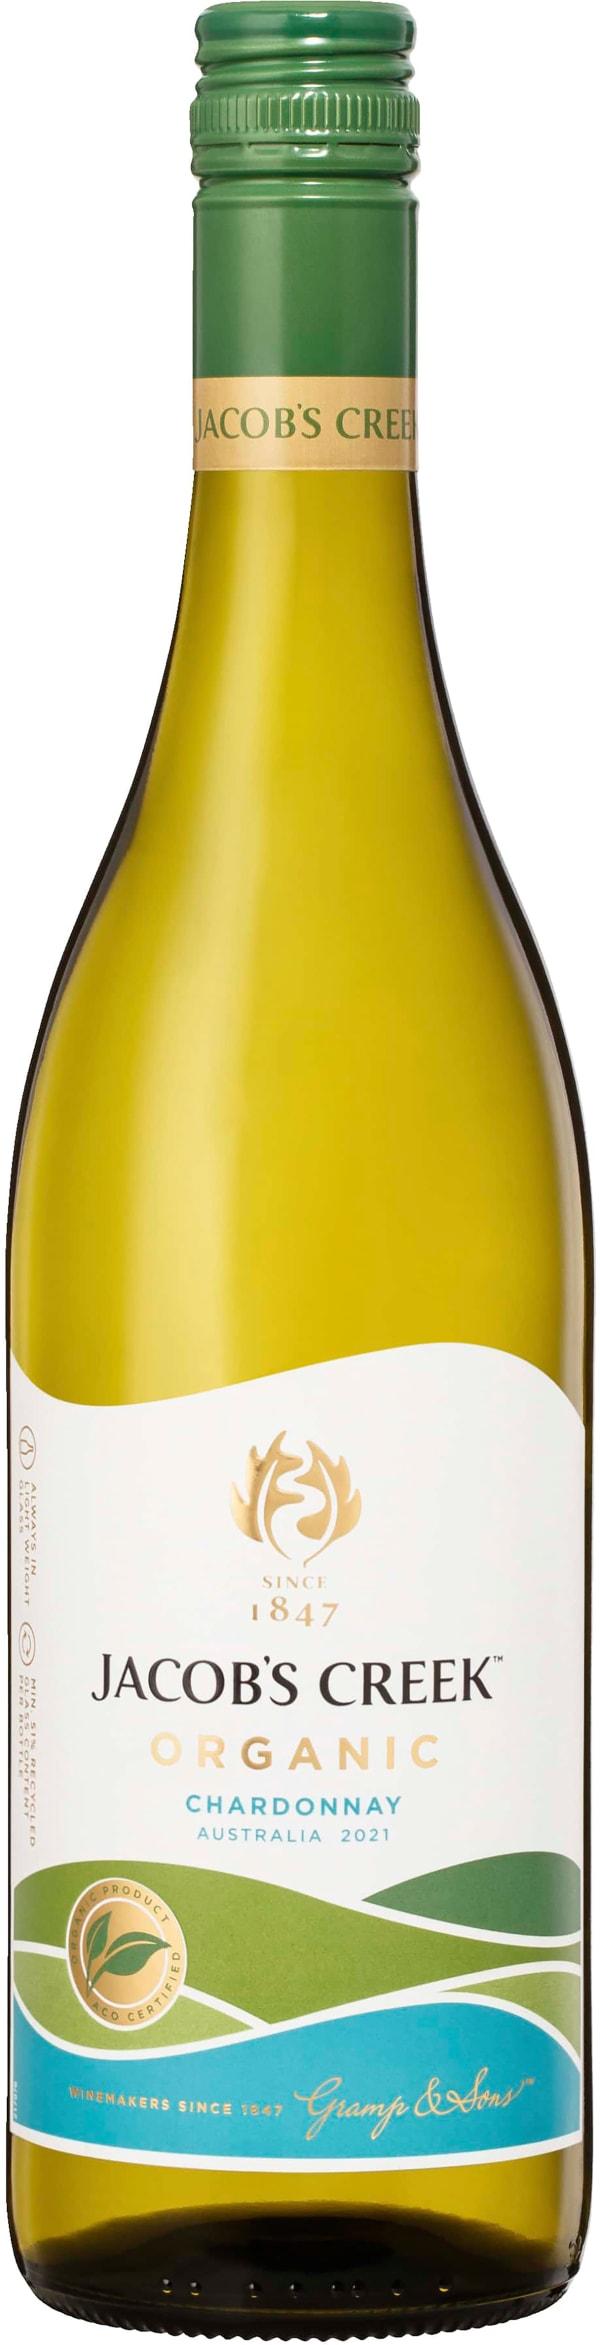 Jacob's Creek Organic Chardonnay 2018